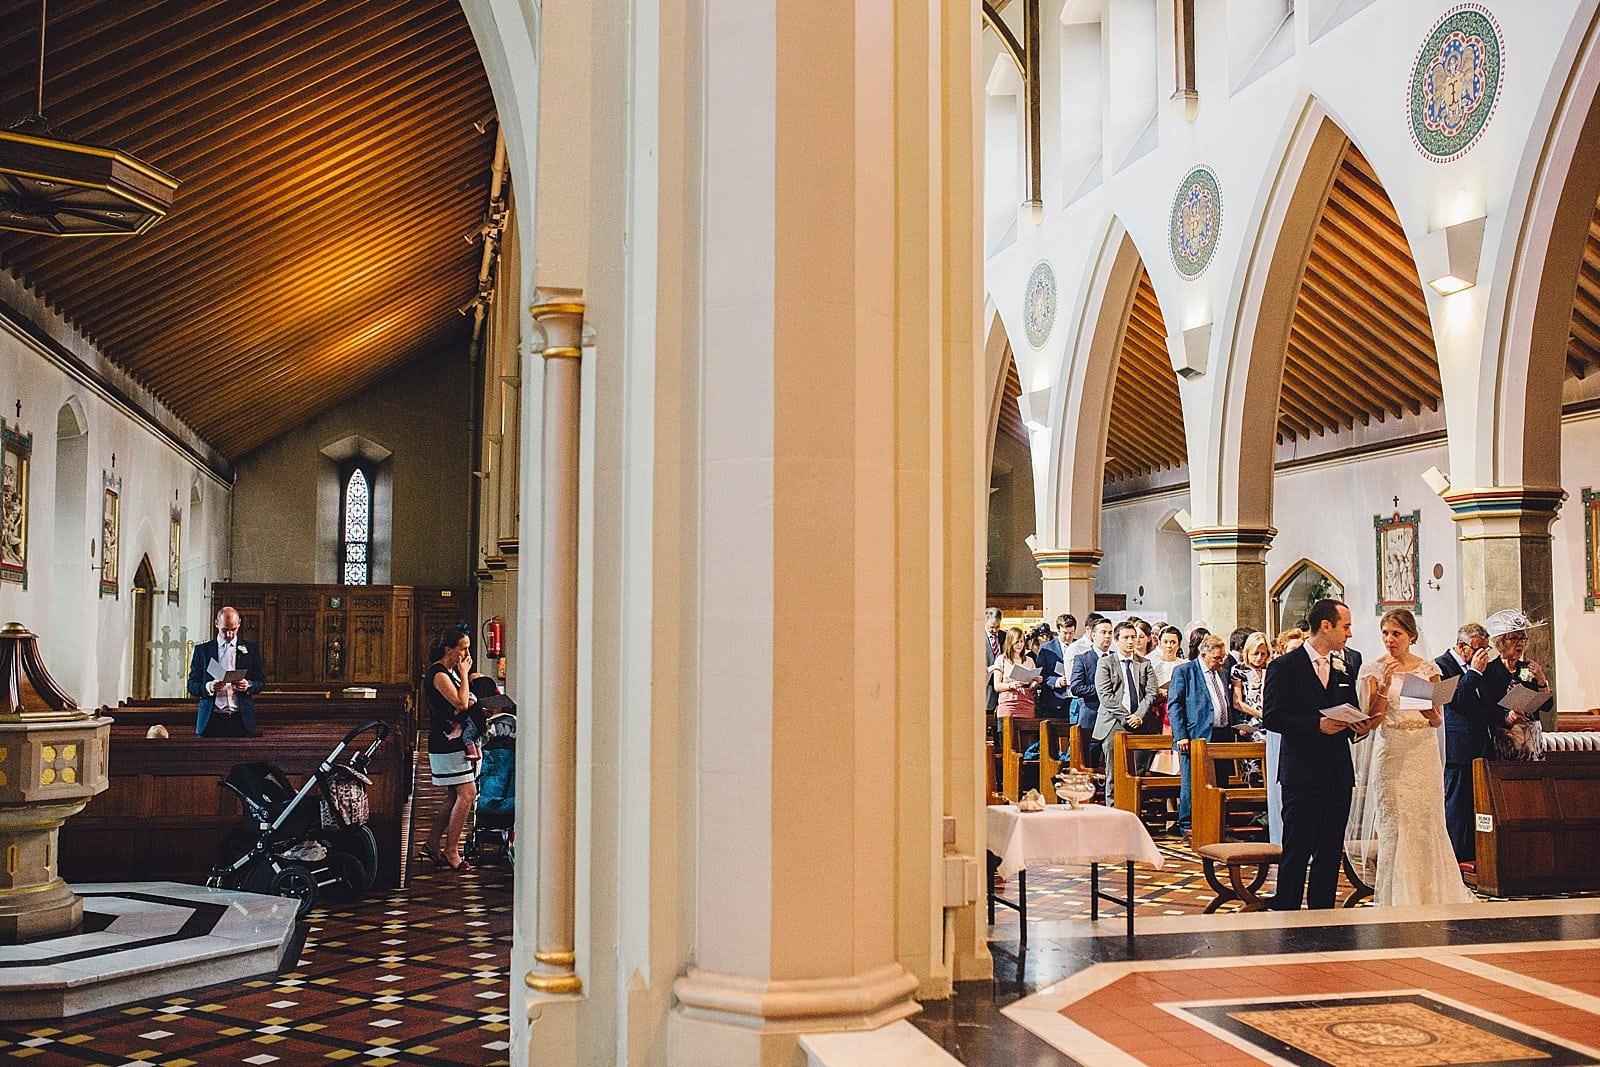 sutton-bonington-hall-wedding-photography_0083